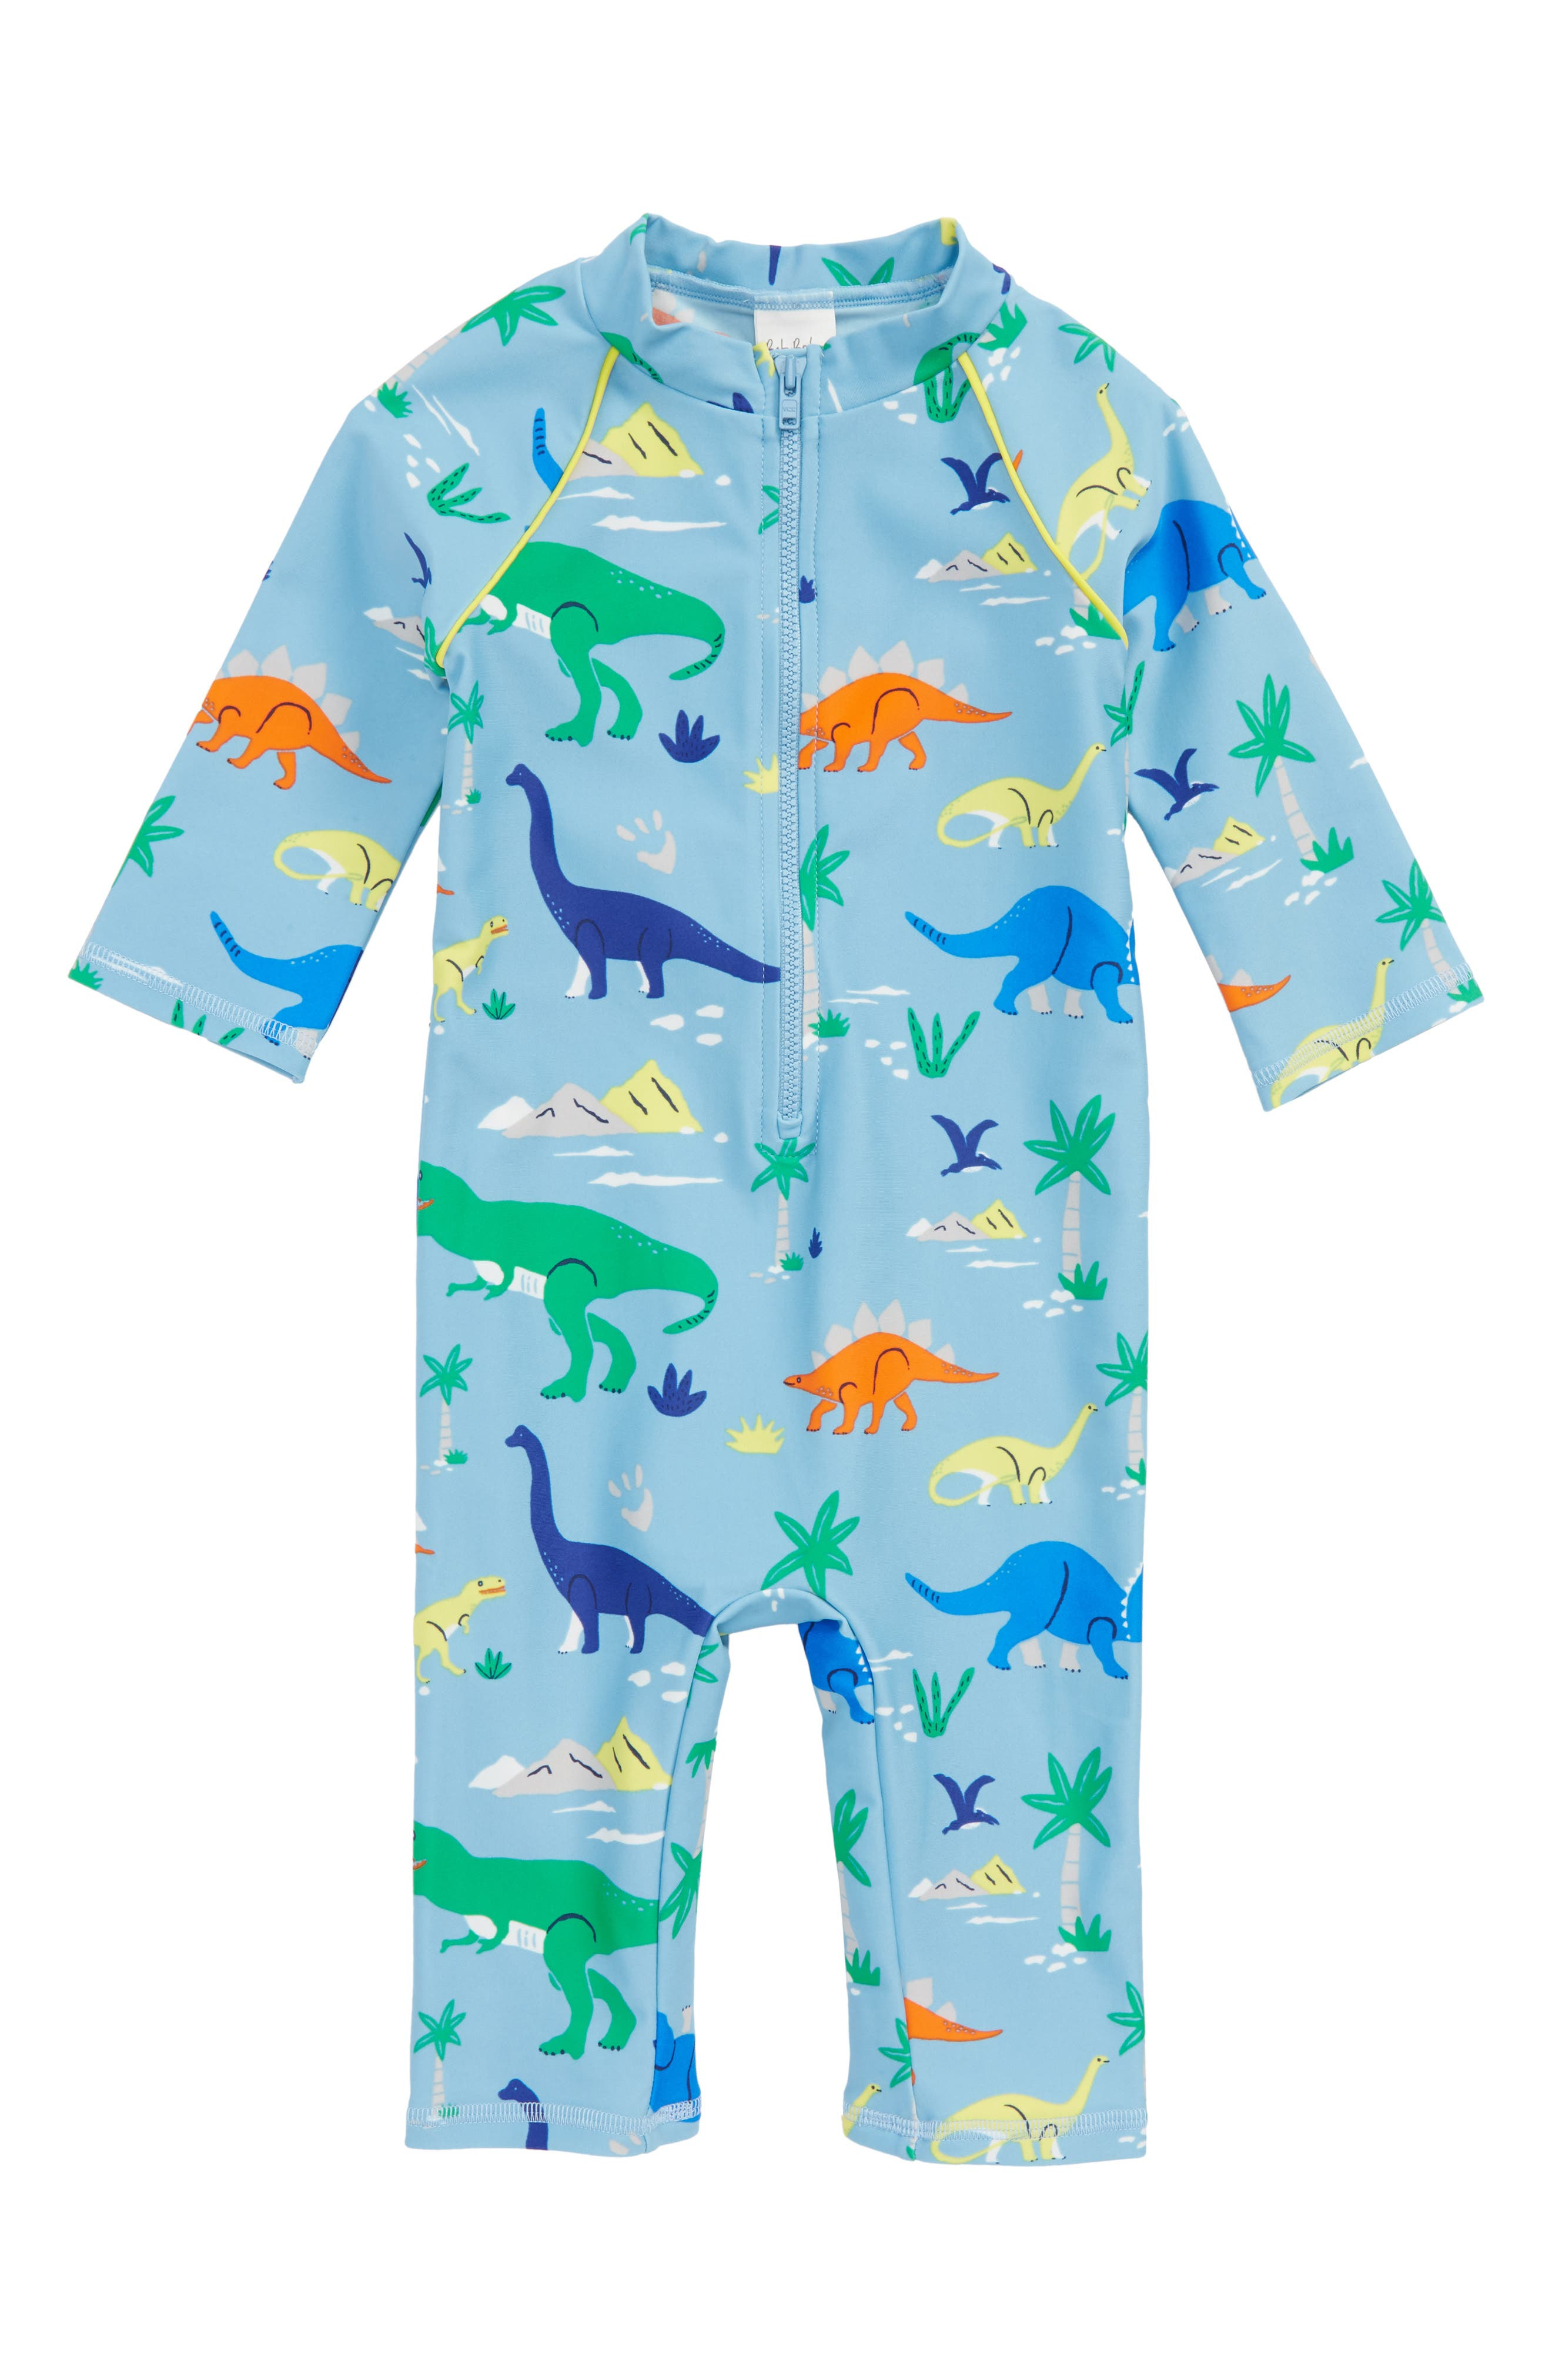 Animal Surf One-Piece Rashguard Swimsuit,                         Main,                         color, 486